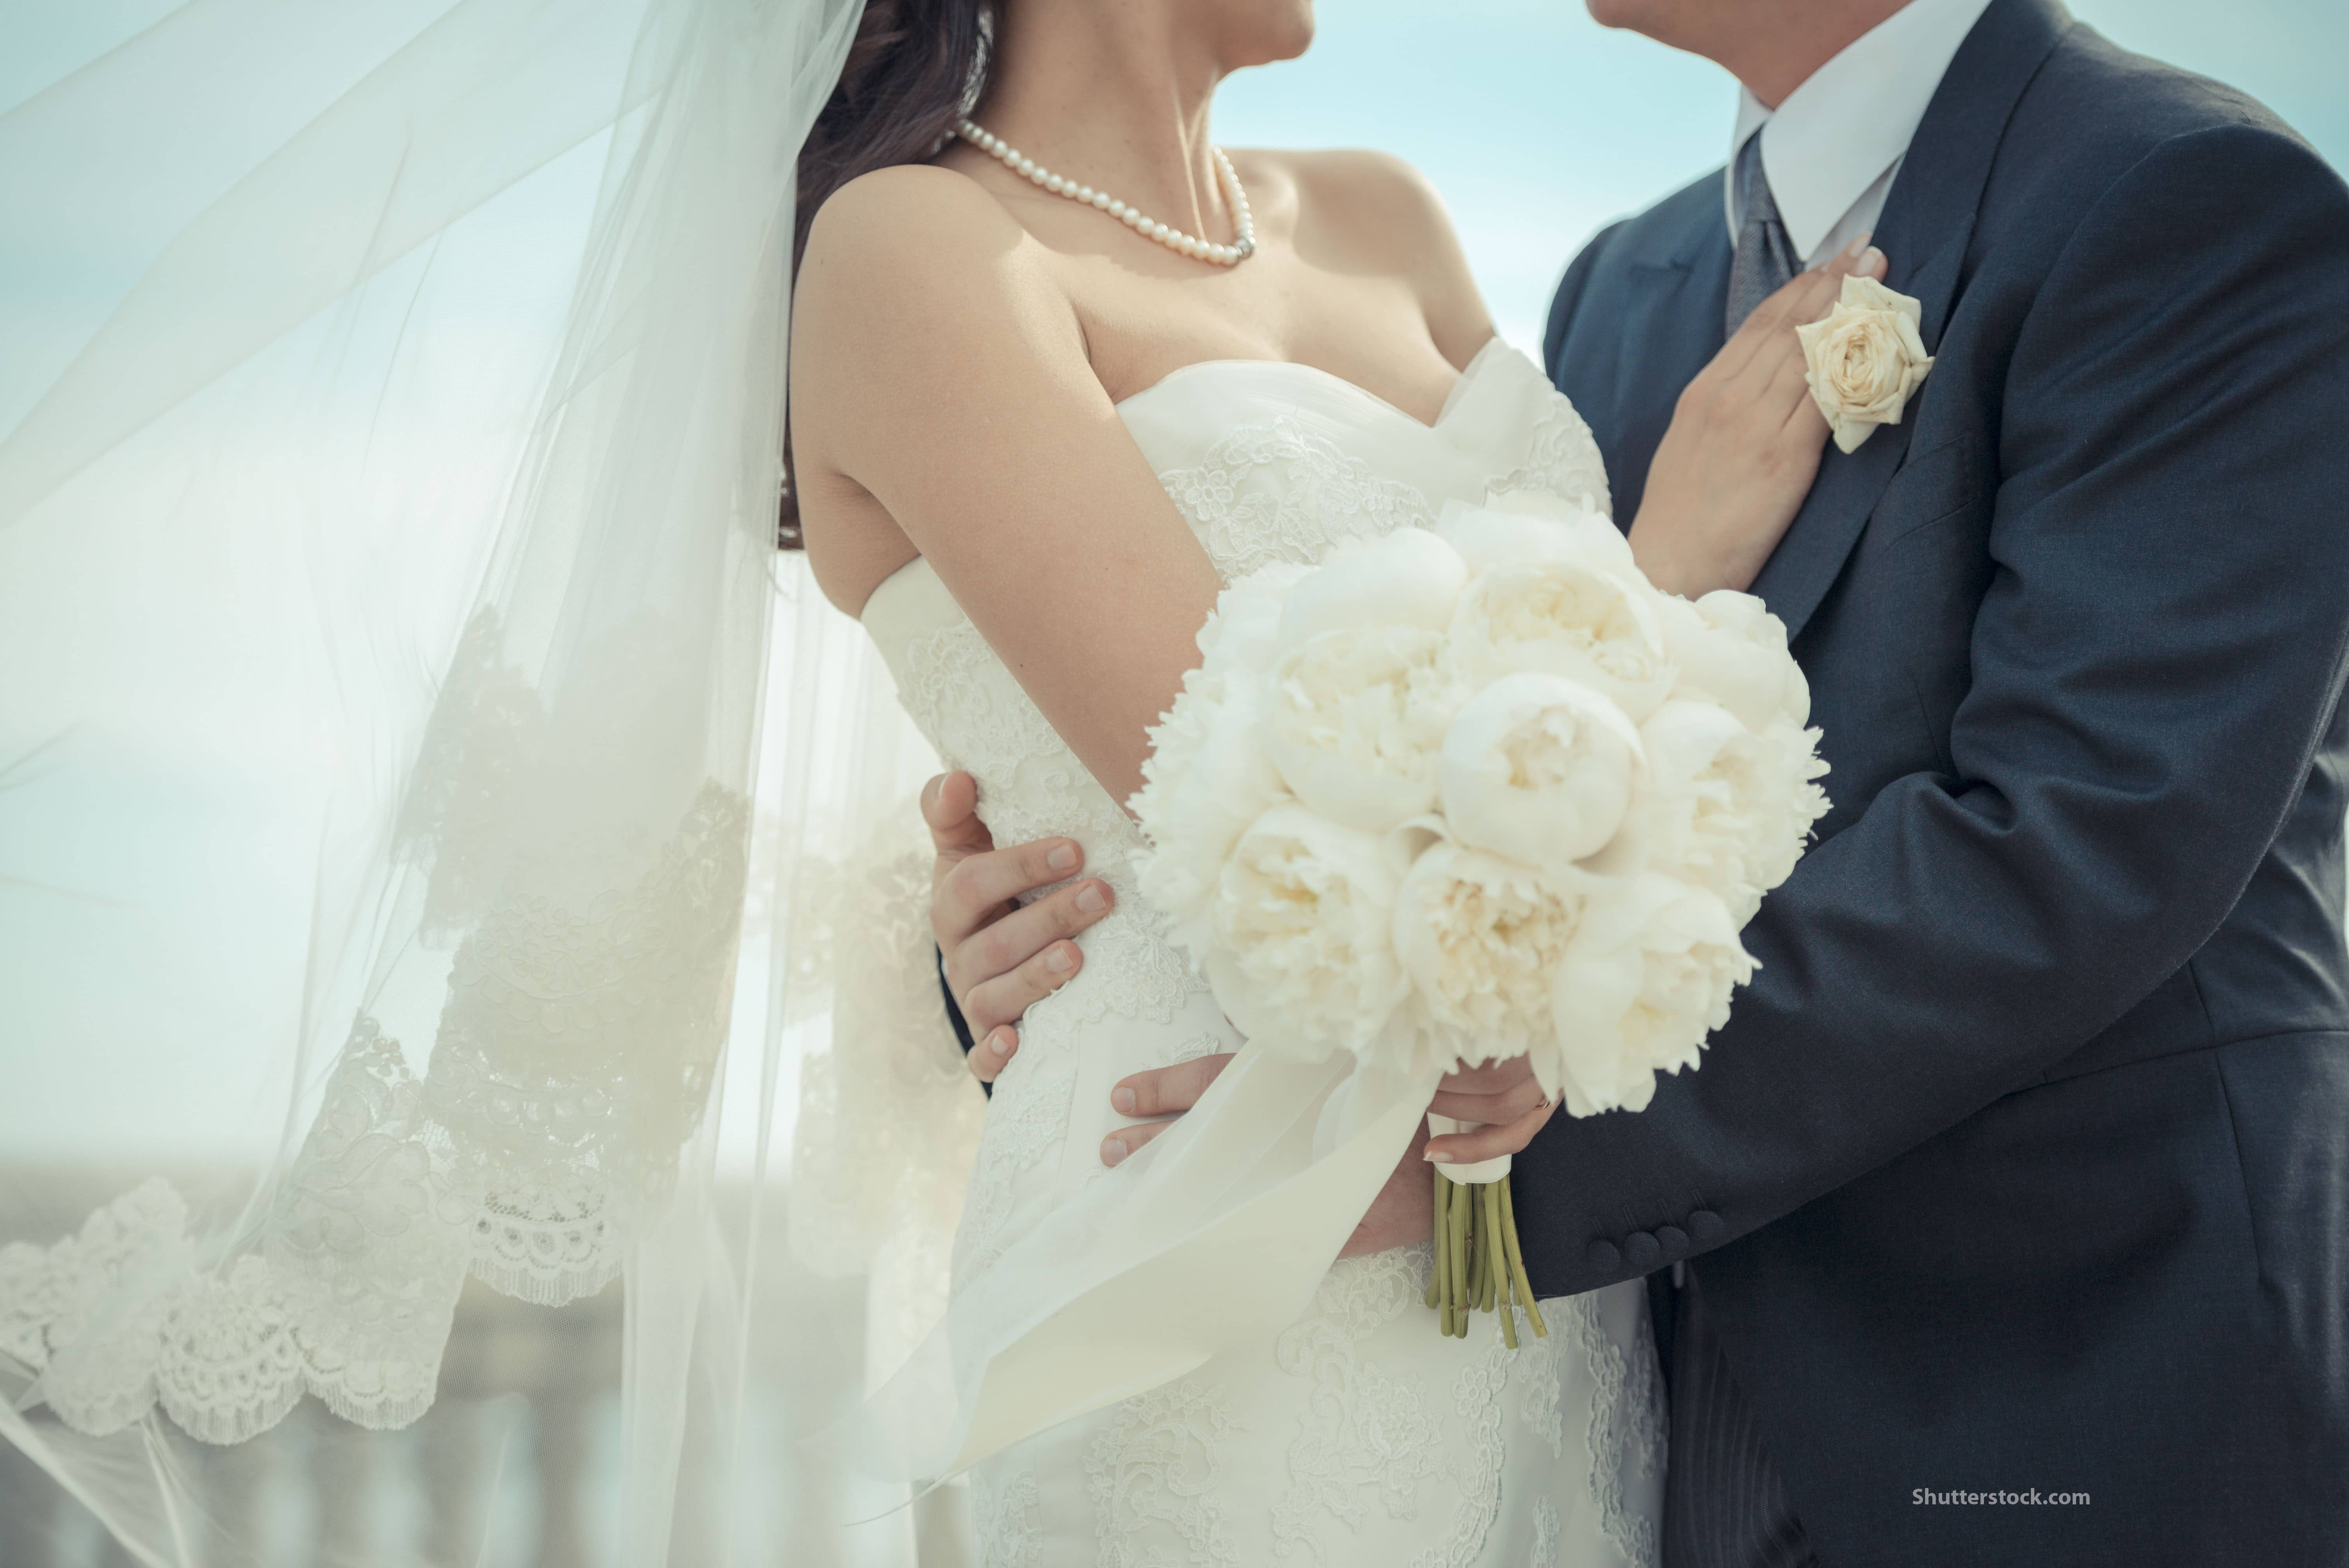 sexual purity, Christian singles, Christian Single advice